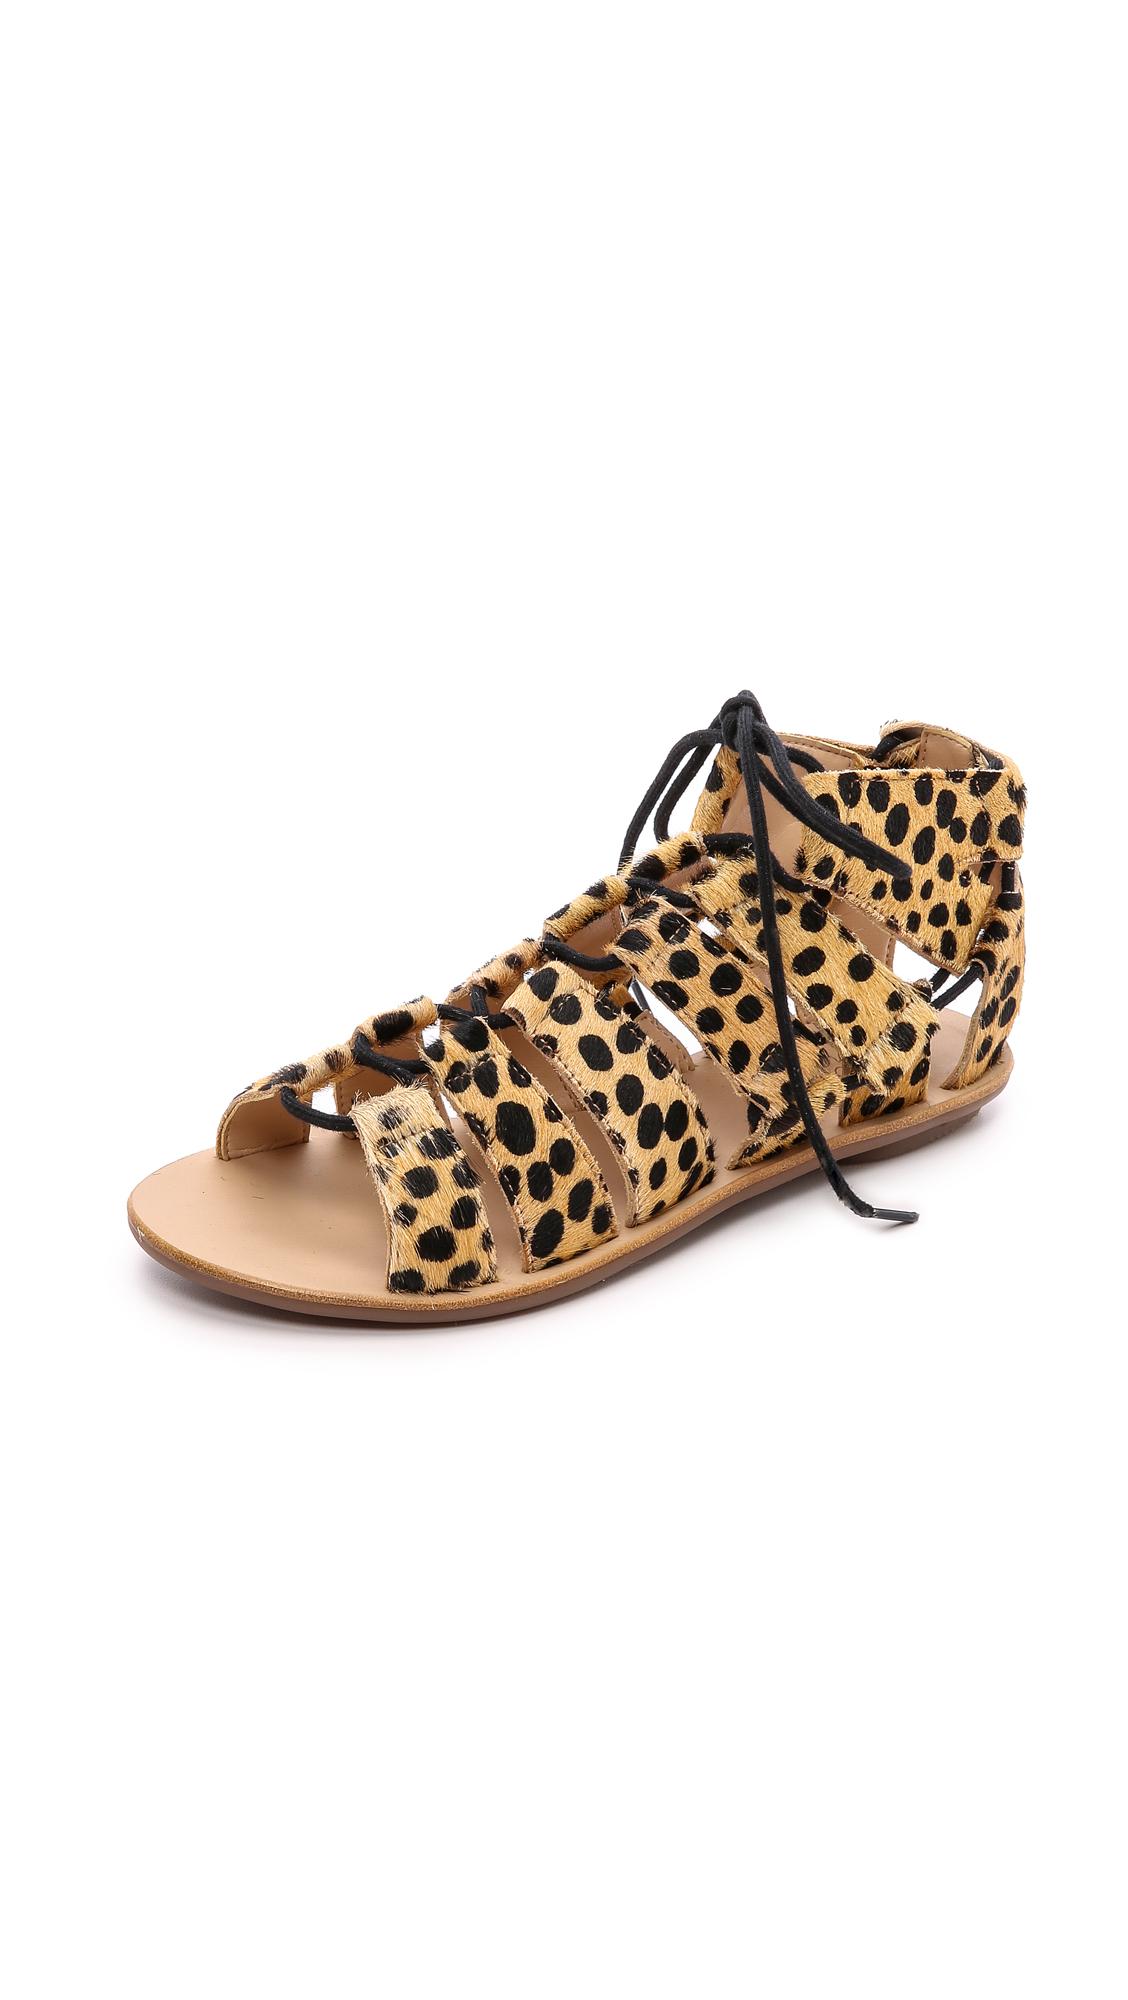 Loeffler Randall Skye Gladiator Sandals Cheetah Lyst